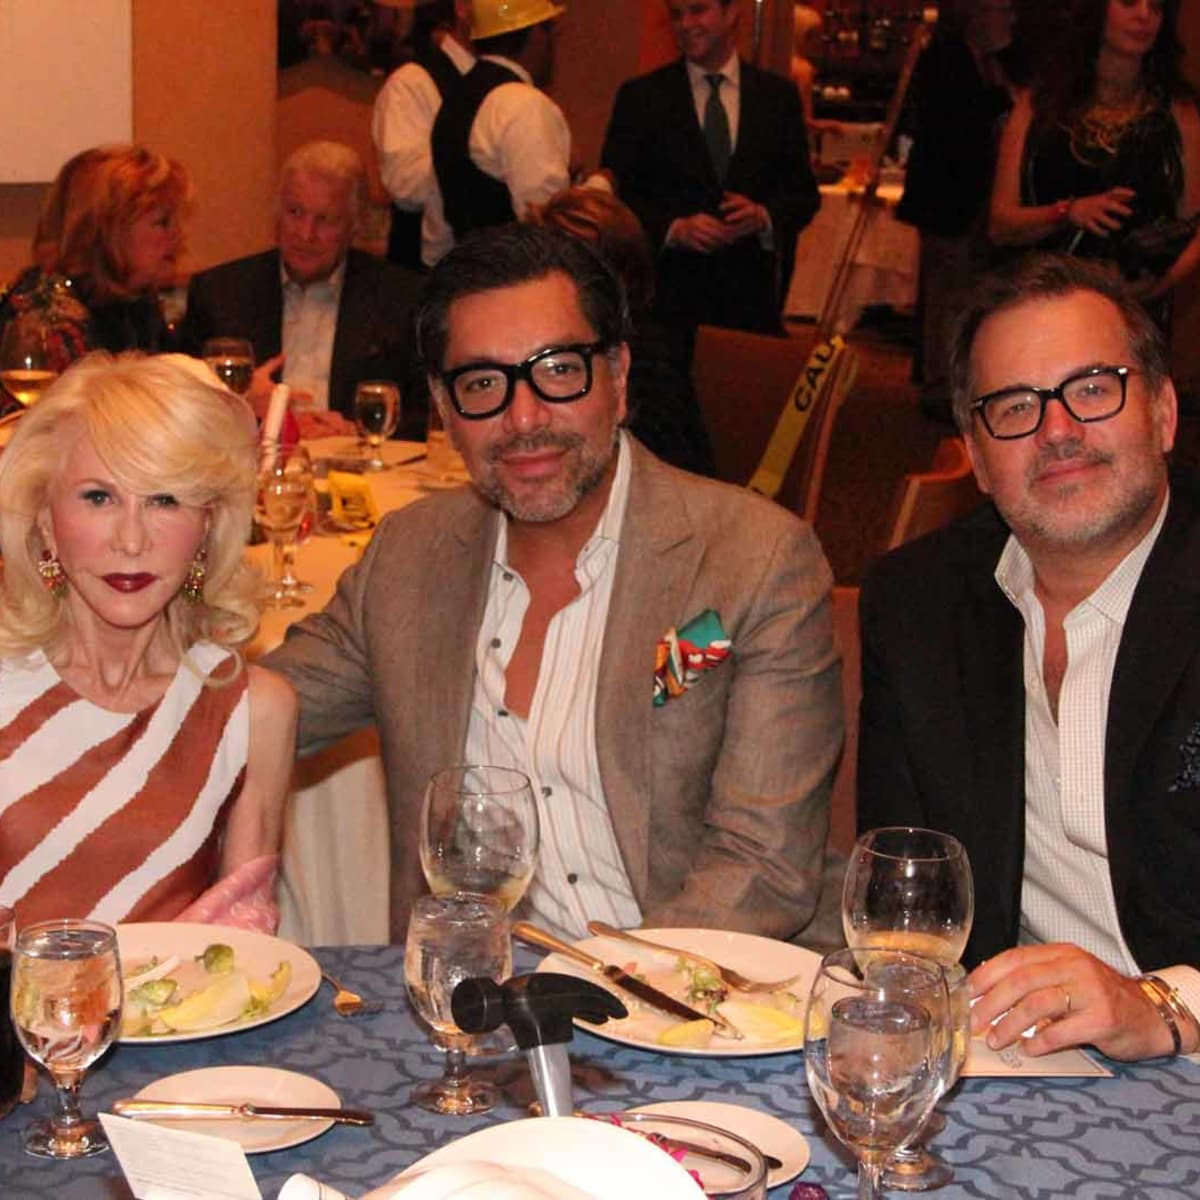 ESCAPE dinner, 4/16, Diane Lokey Farb, Ceron, Todd Fiscus